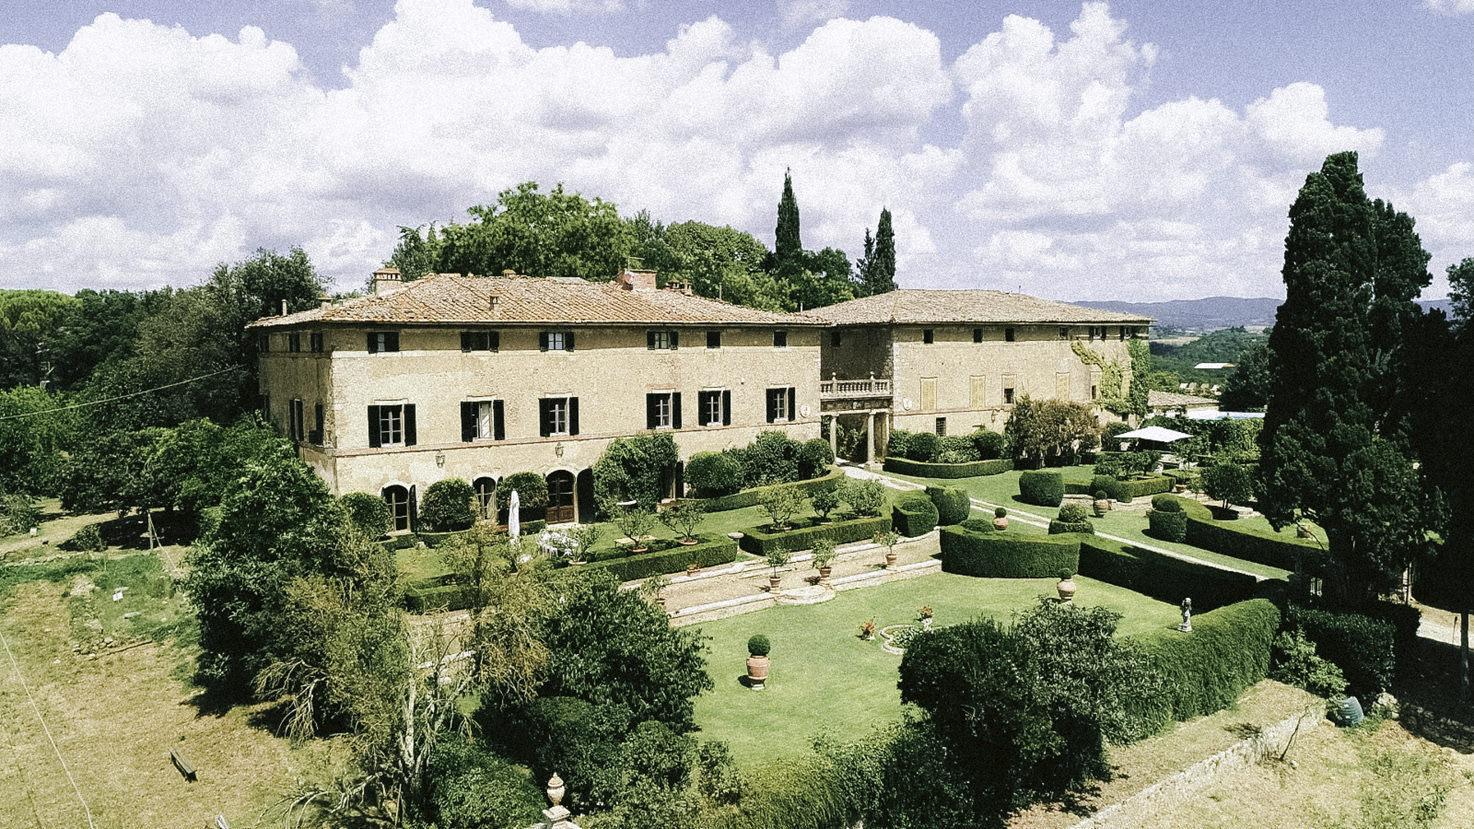 Aerial view of Borgo Stomennano